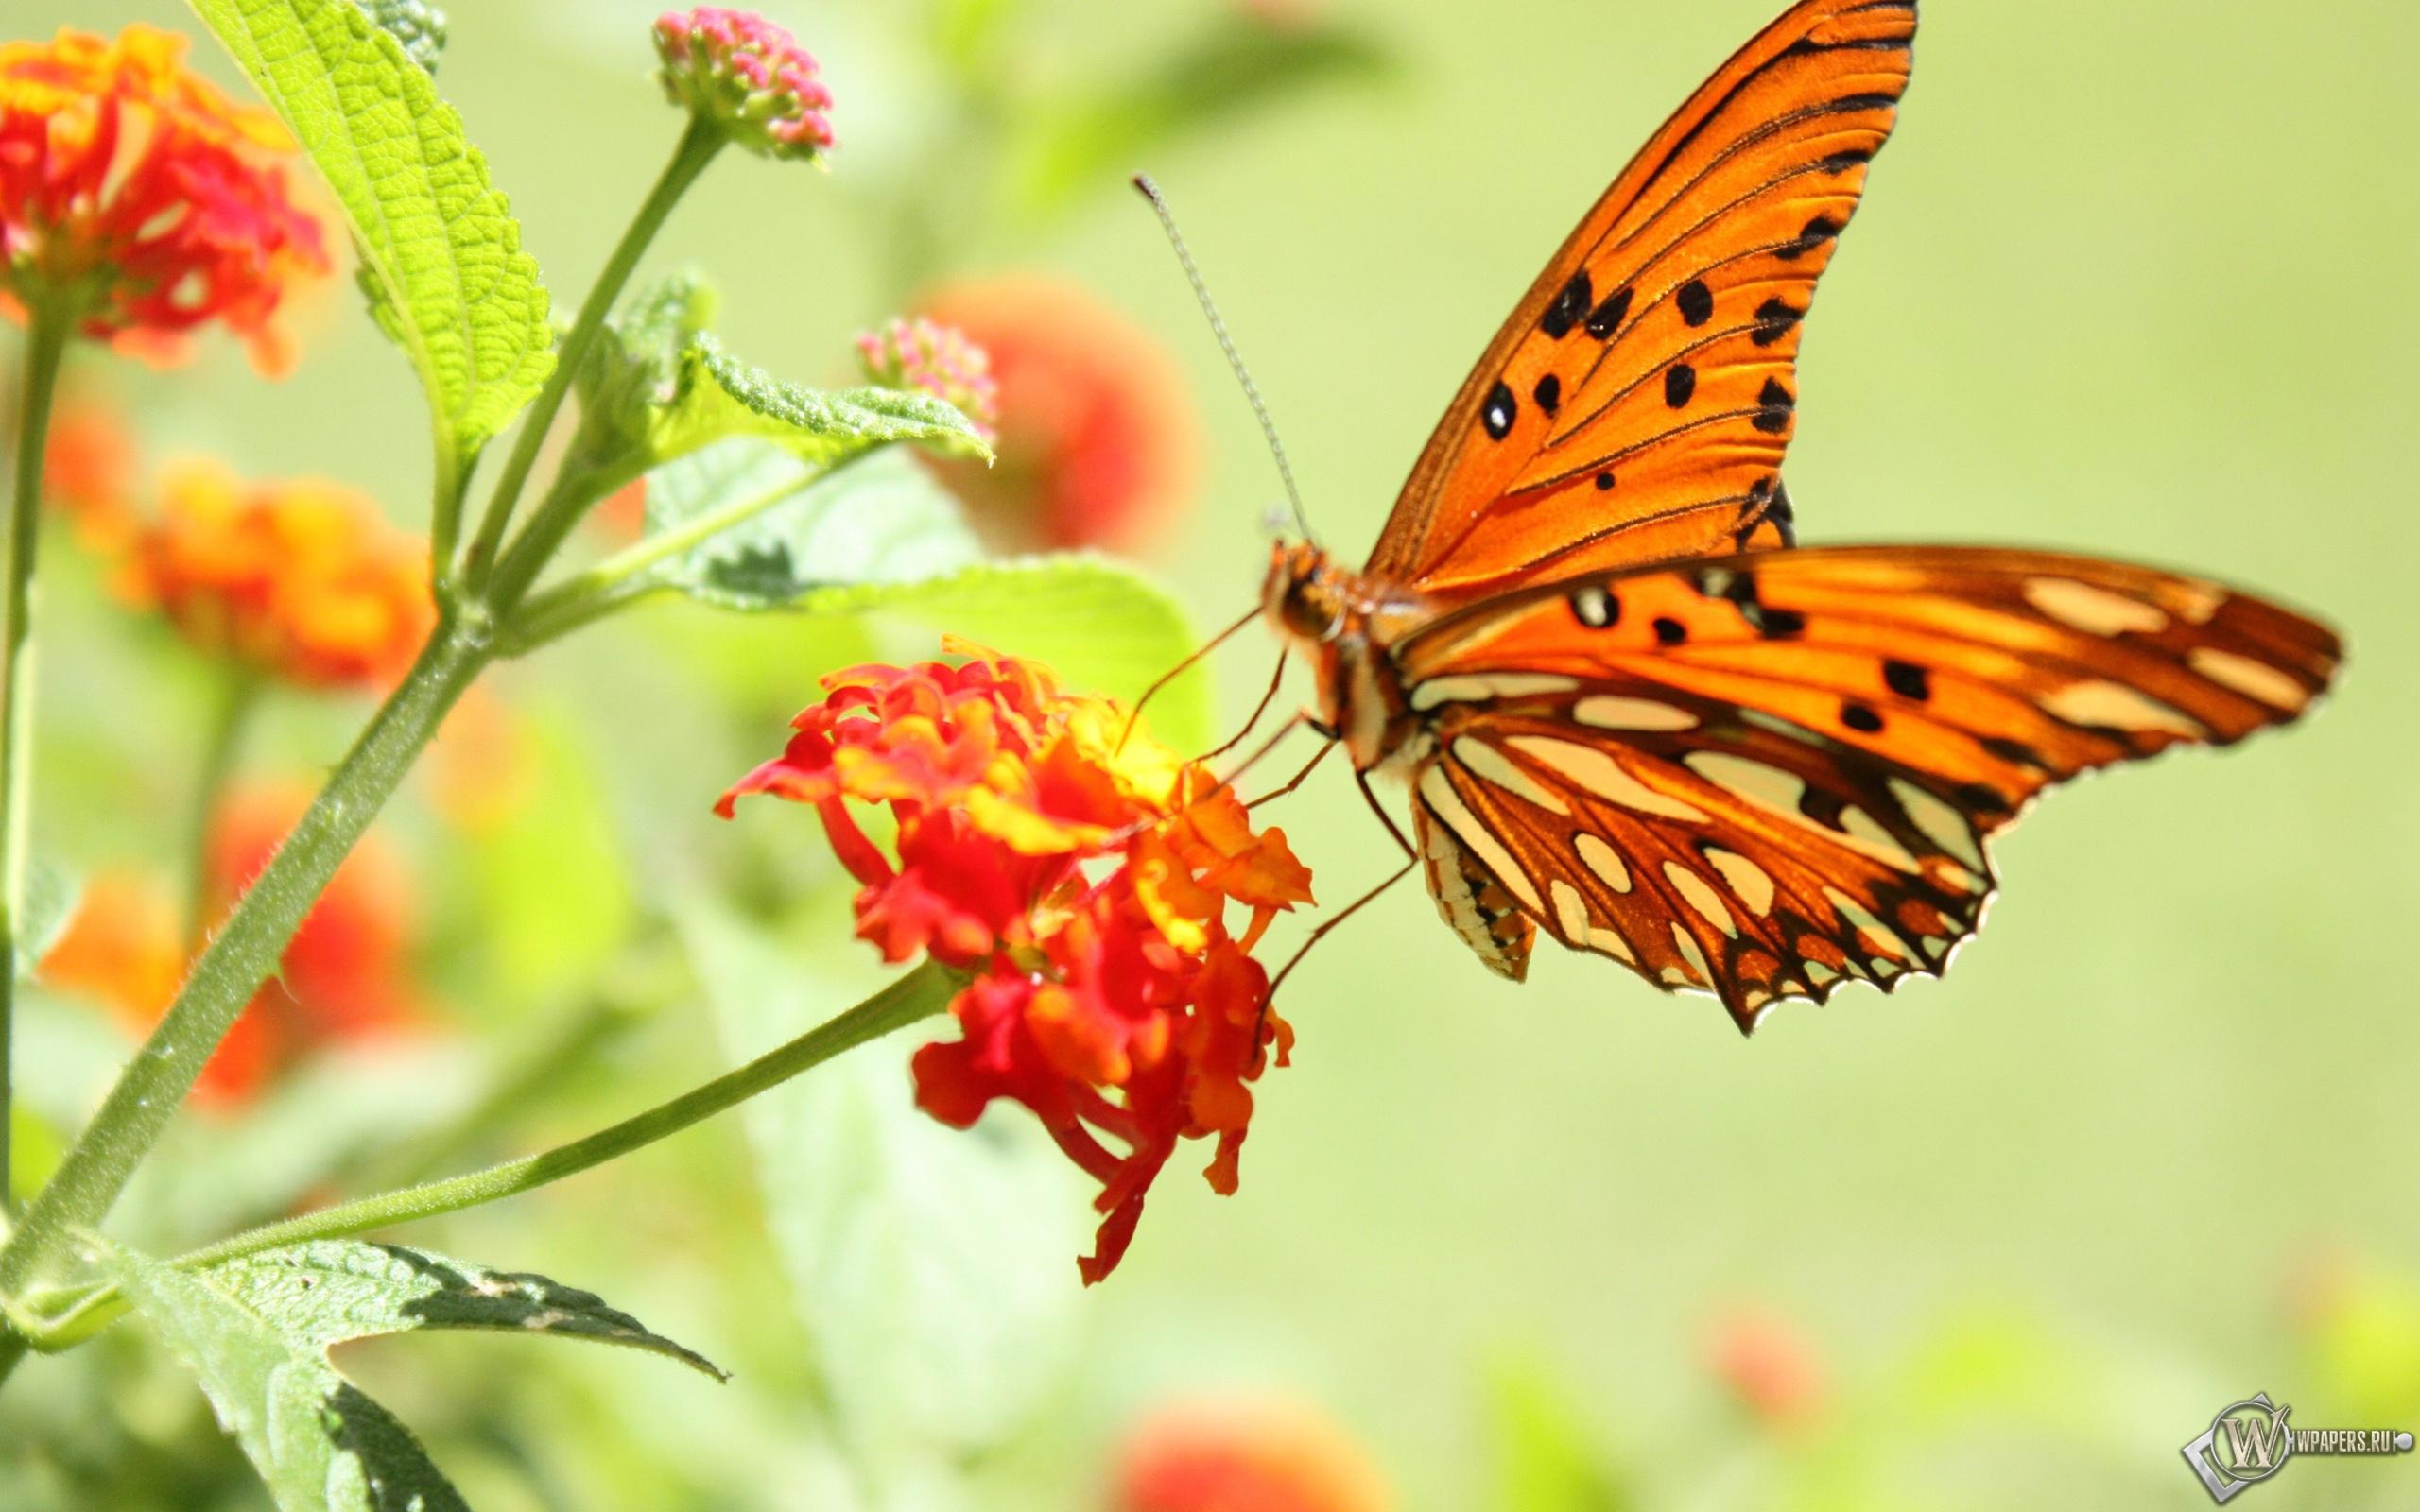 Бабочка на цветке 2560x1600